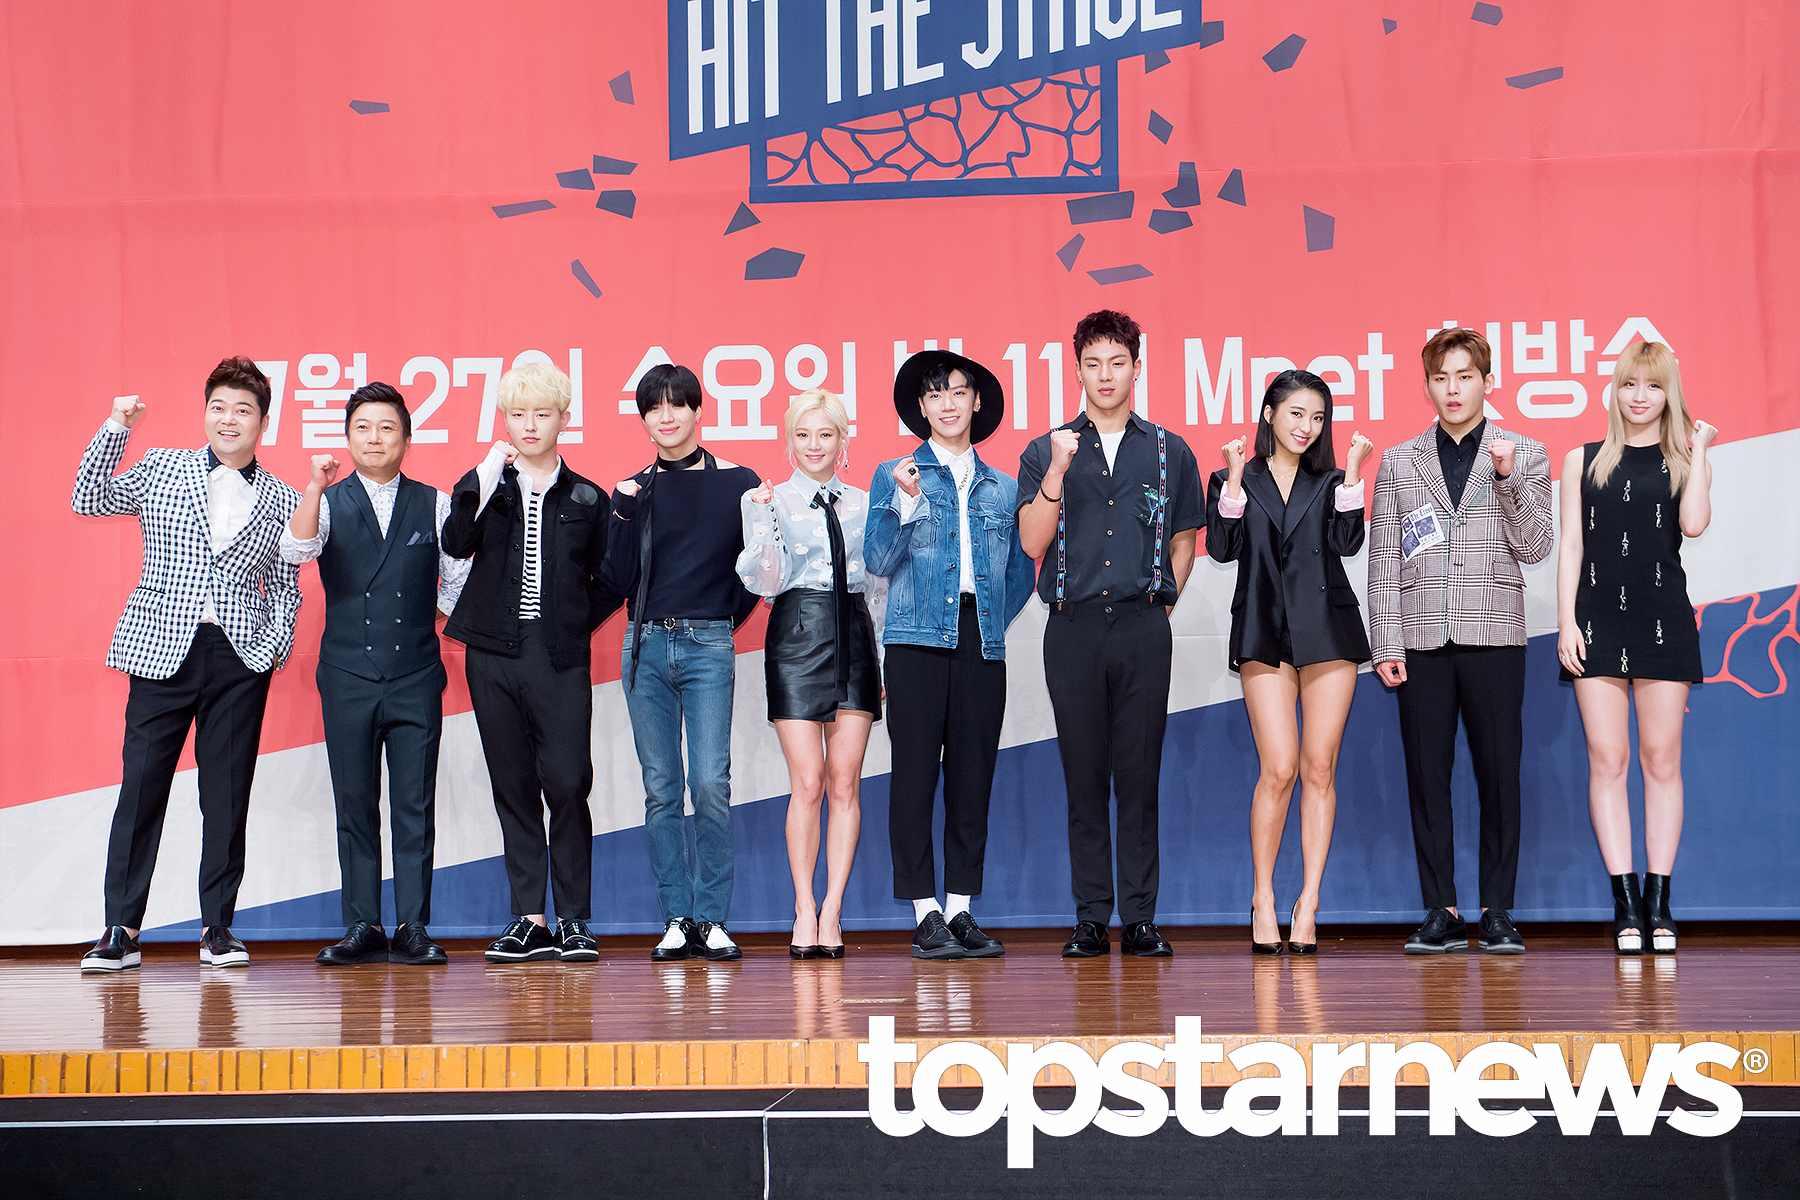 Mnet新節目《Hit The Stage》本周三首播,創下平均1.8%,最高2.3%的收視率~而第一集就要參賽歌手們,脫掉偶像的外衣,變得「邪惡」起來!